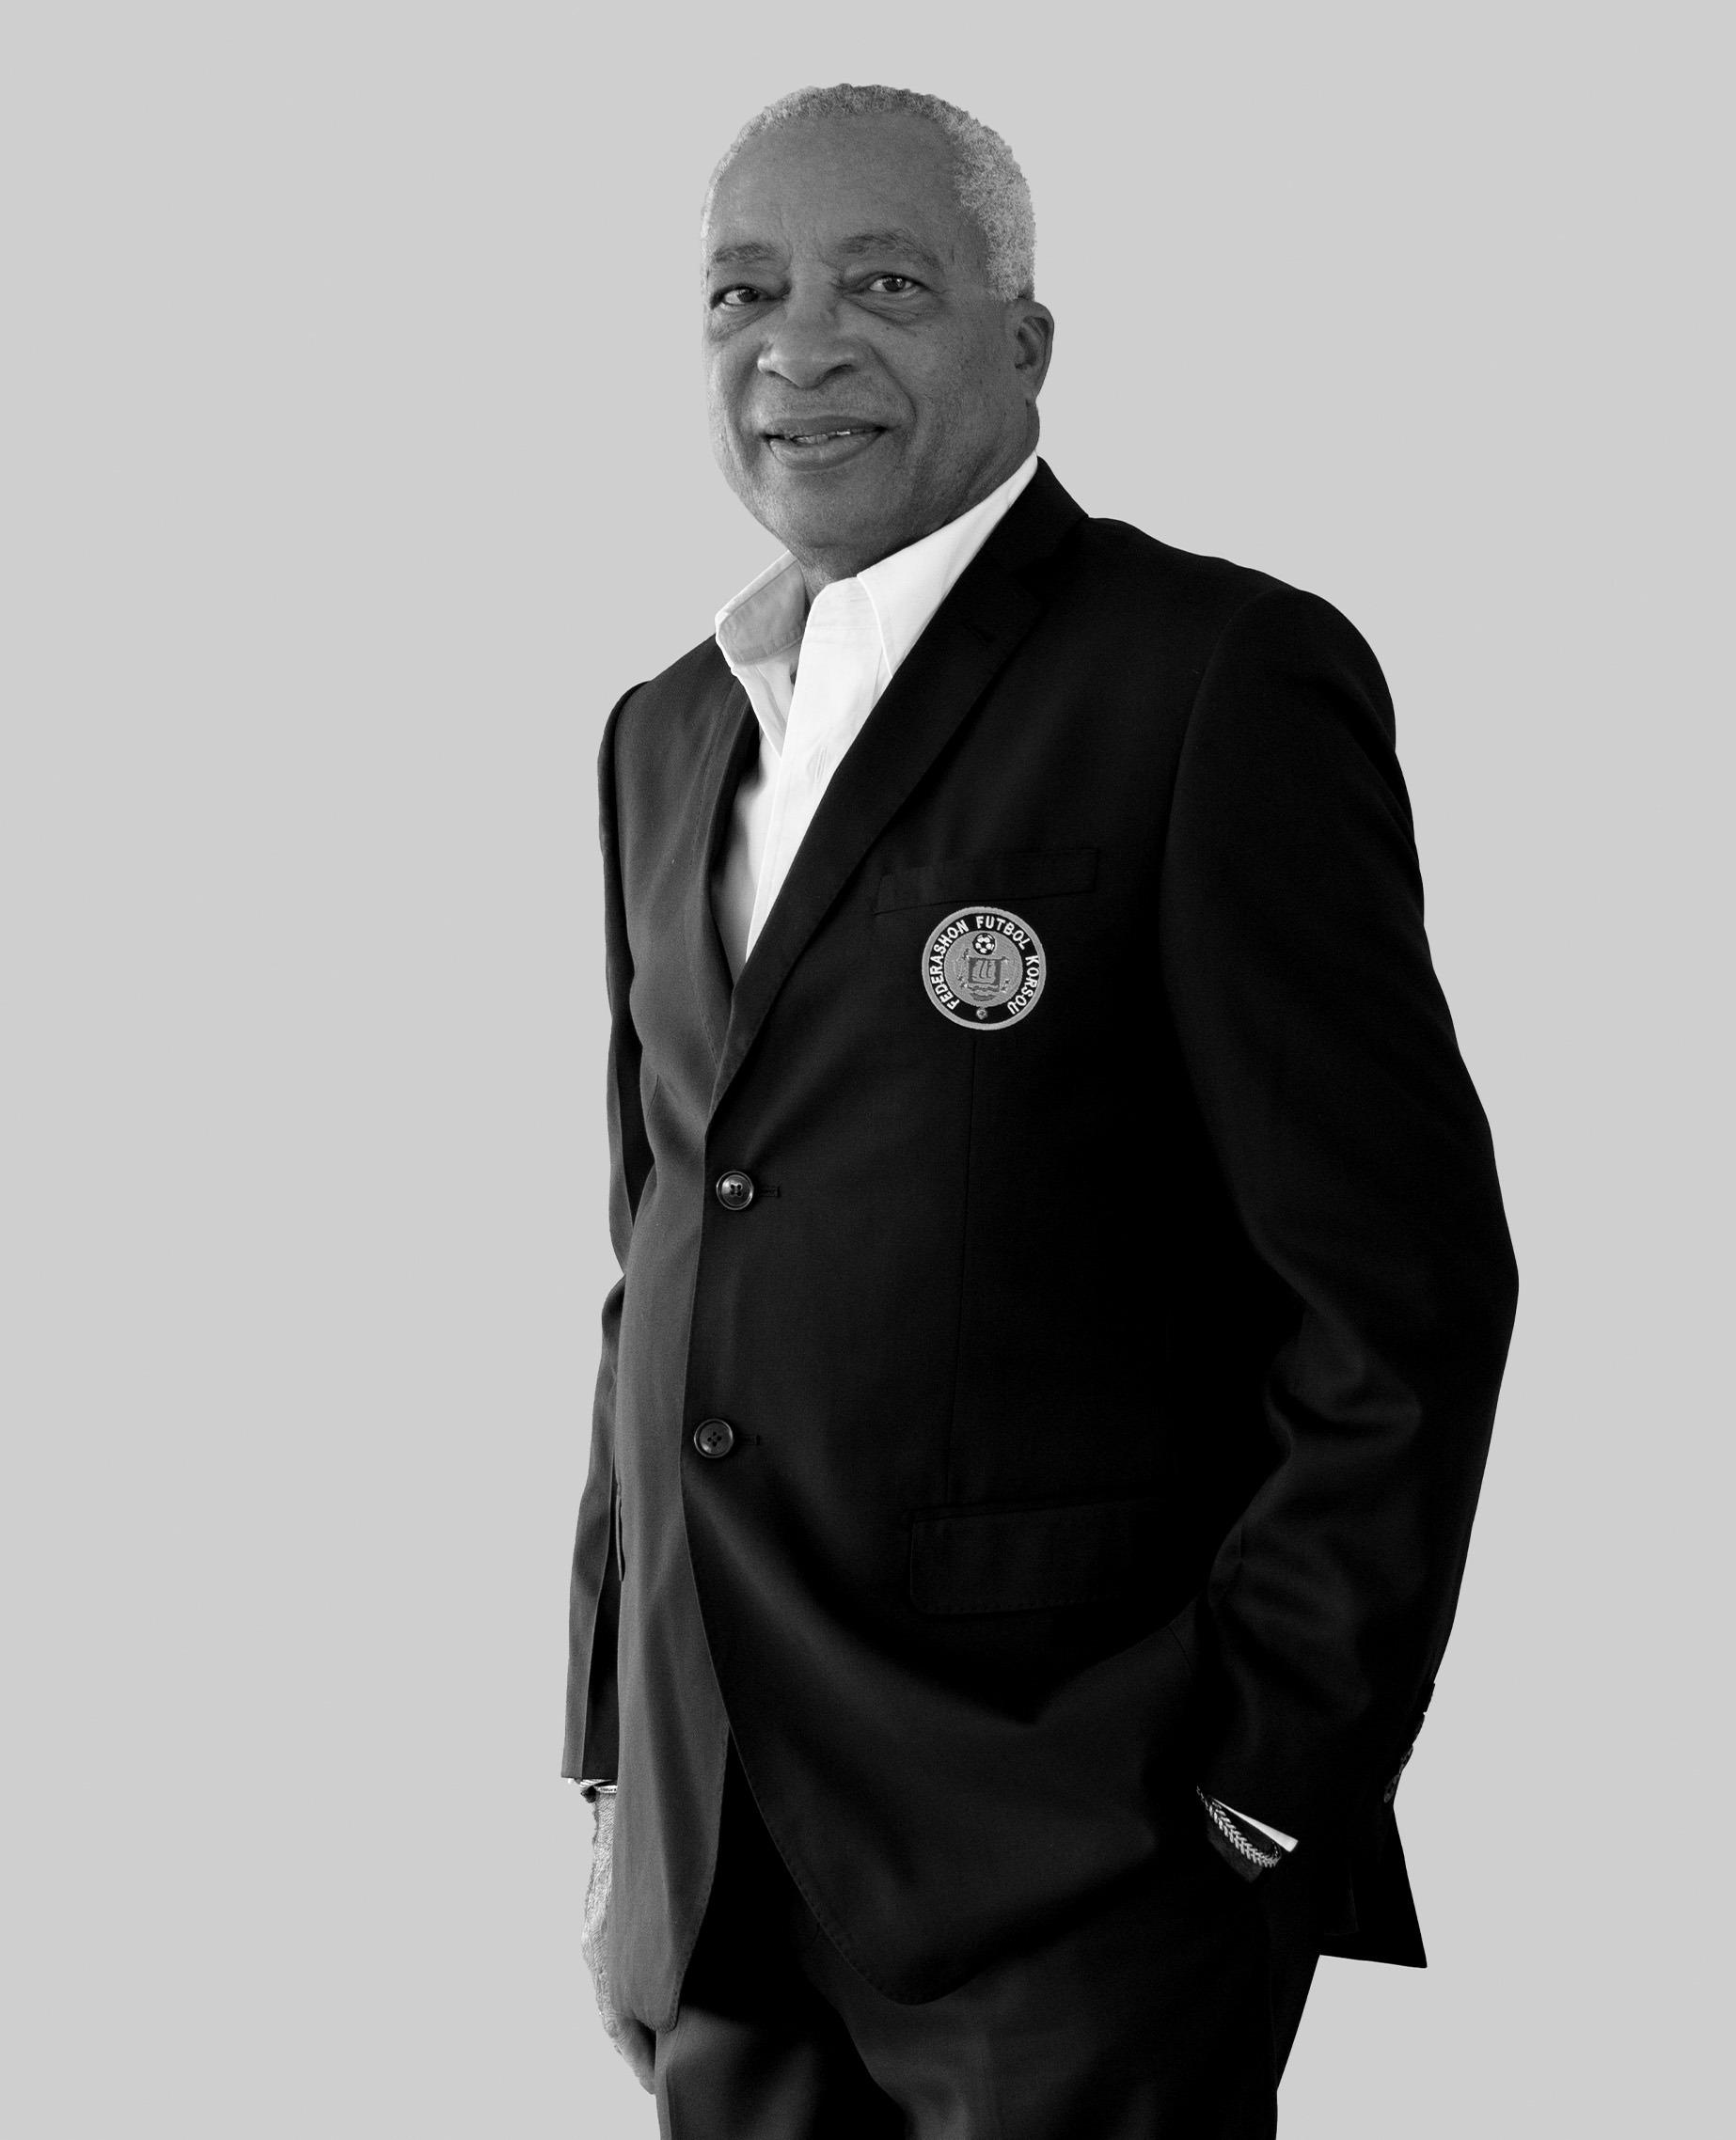 Franklin Mathilda, is a board member of Curacao Football Federation.